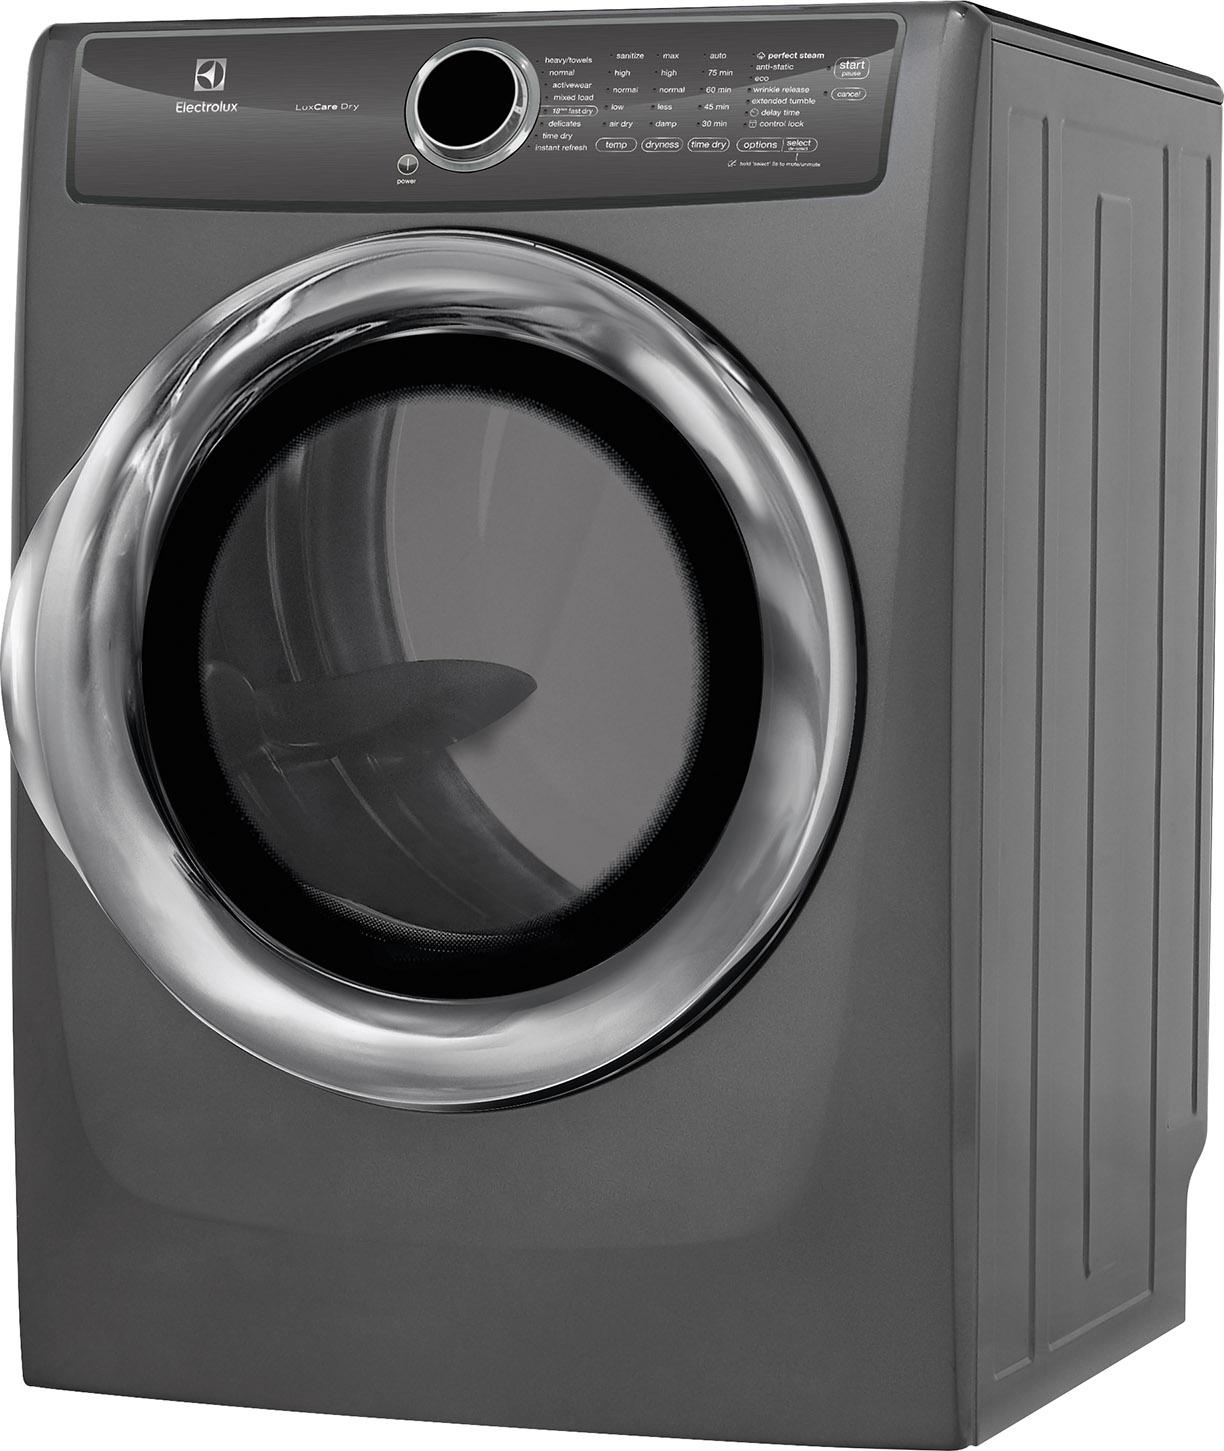 Electrolux Front Load Electric Dryer Titanium Efme527utt Washing Machine Wiring Diagram